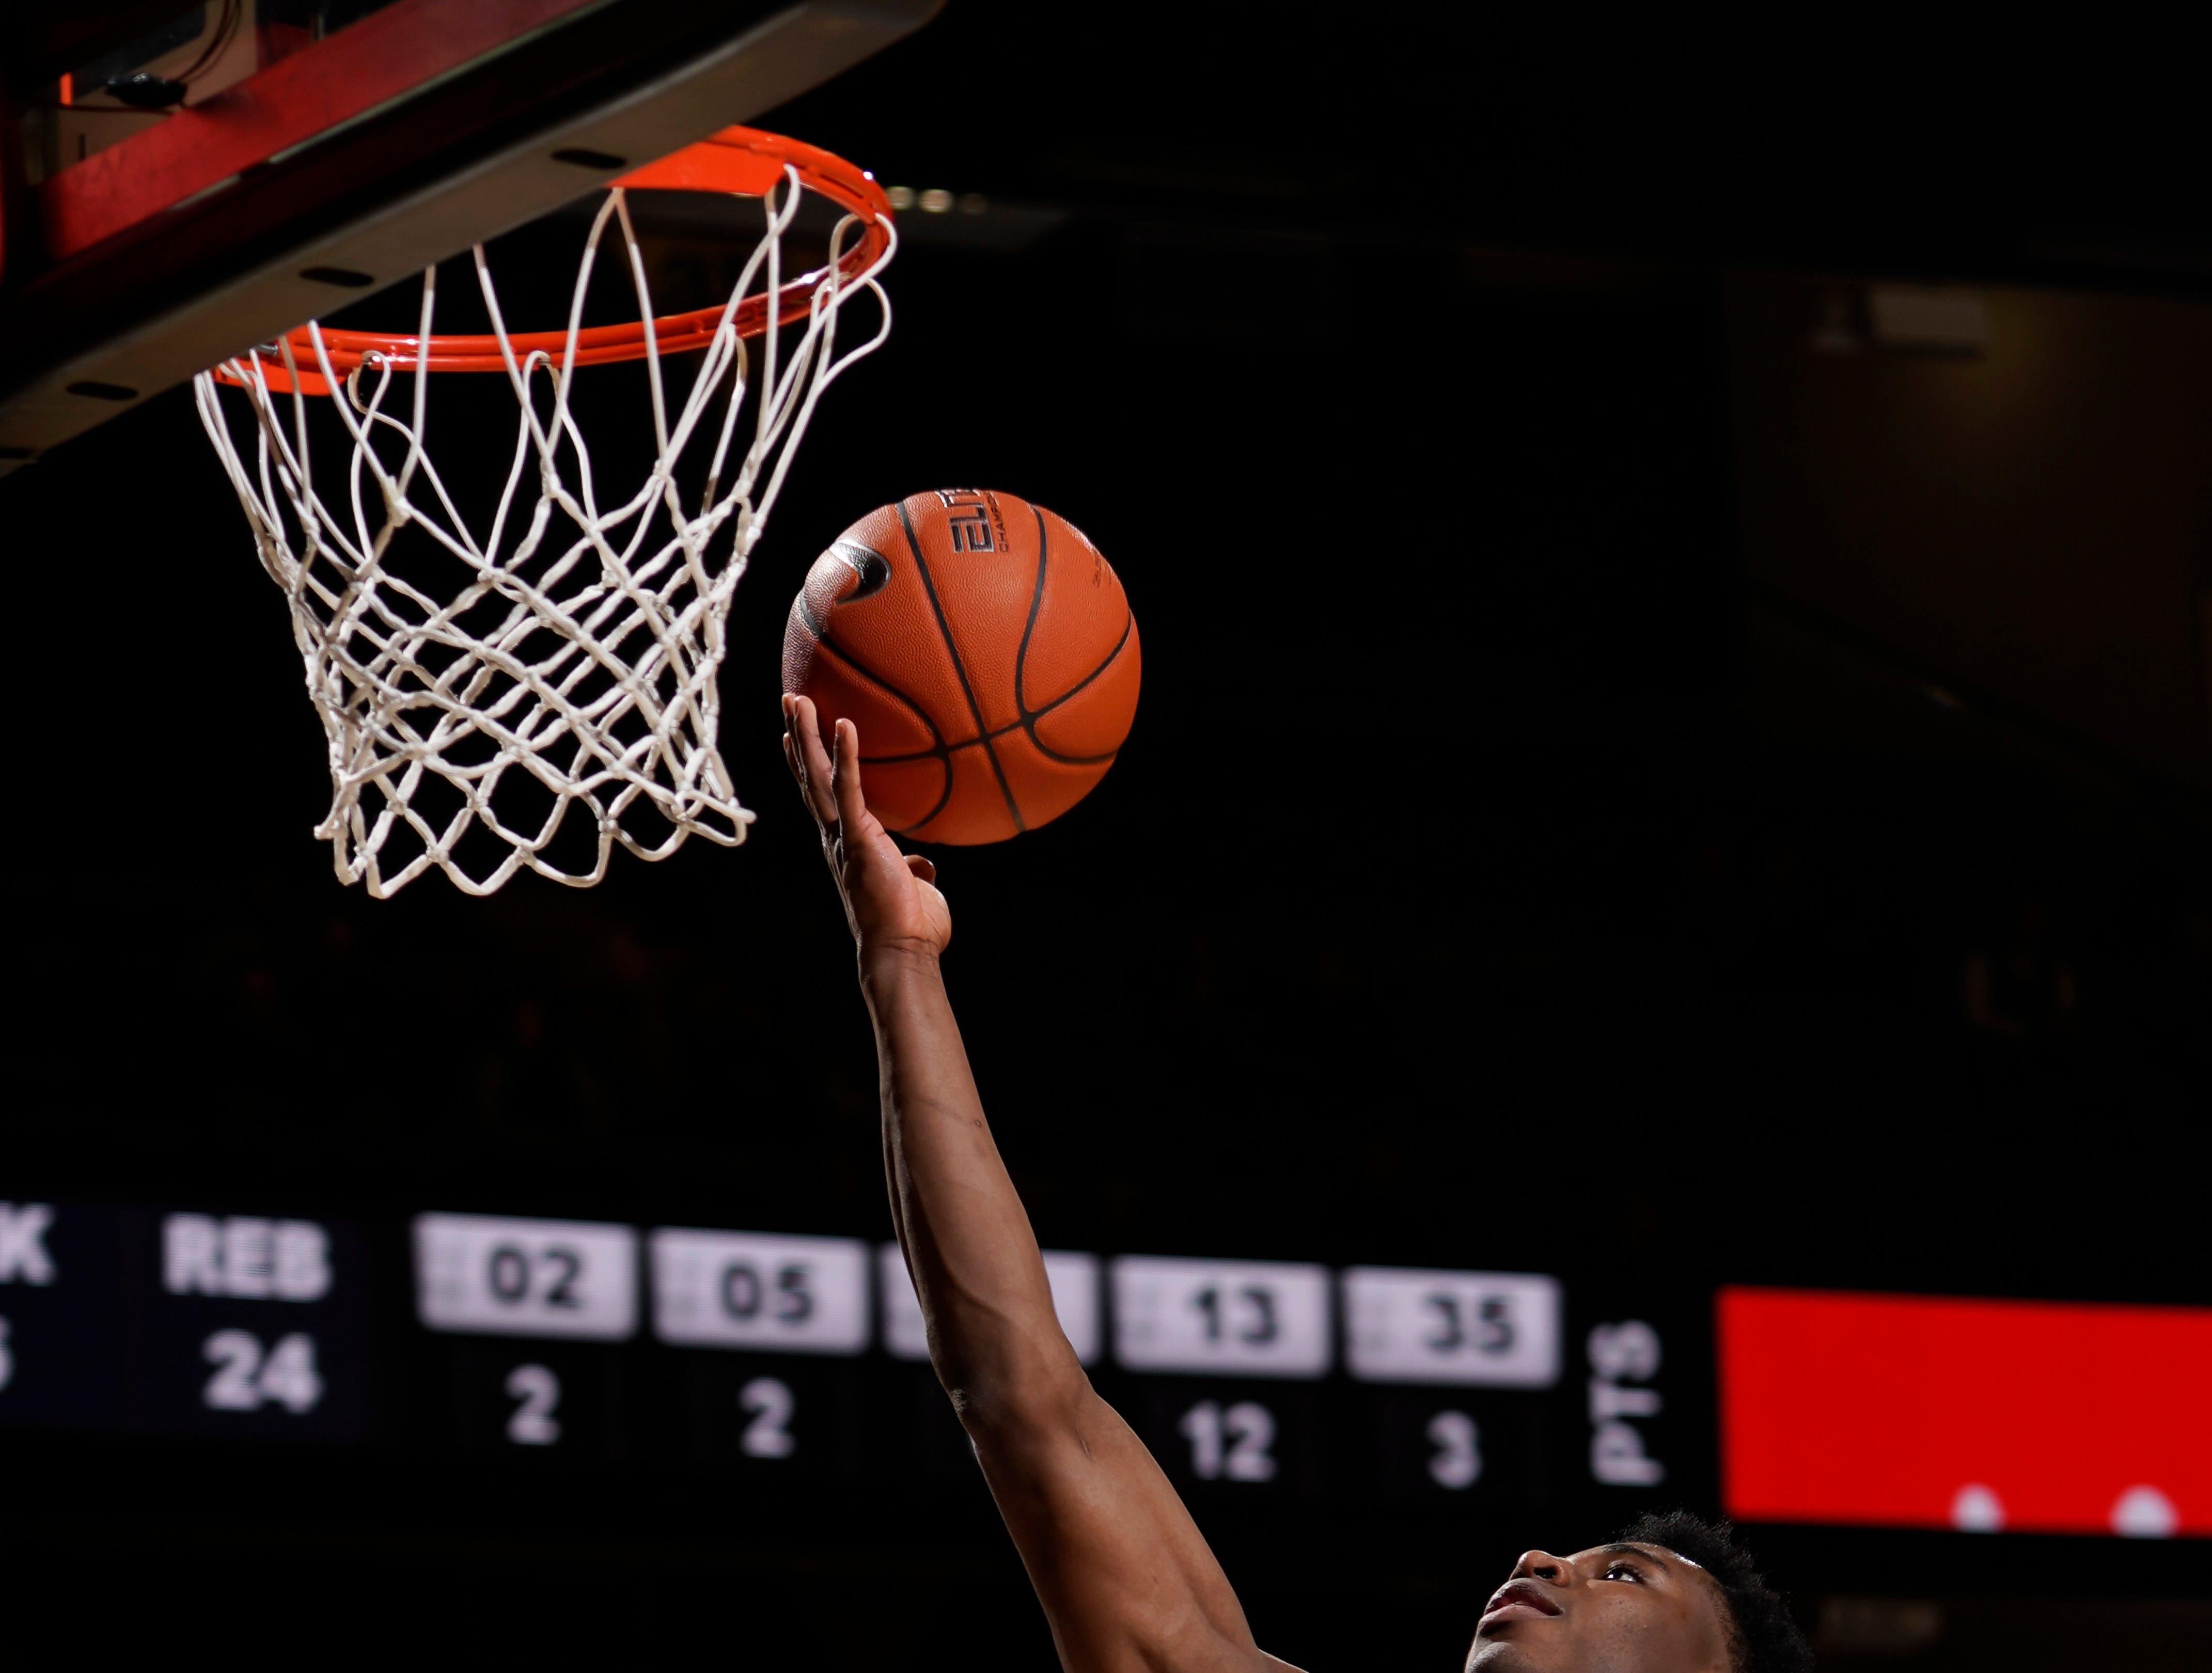 Vanderbilt forward Aaron Nesmith (24) shoots a basket past the Arkansas defense during the second half at Memorial Gym Wednesday, March 6, 2019 in Nashville, Tenn.